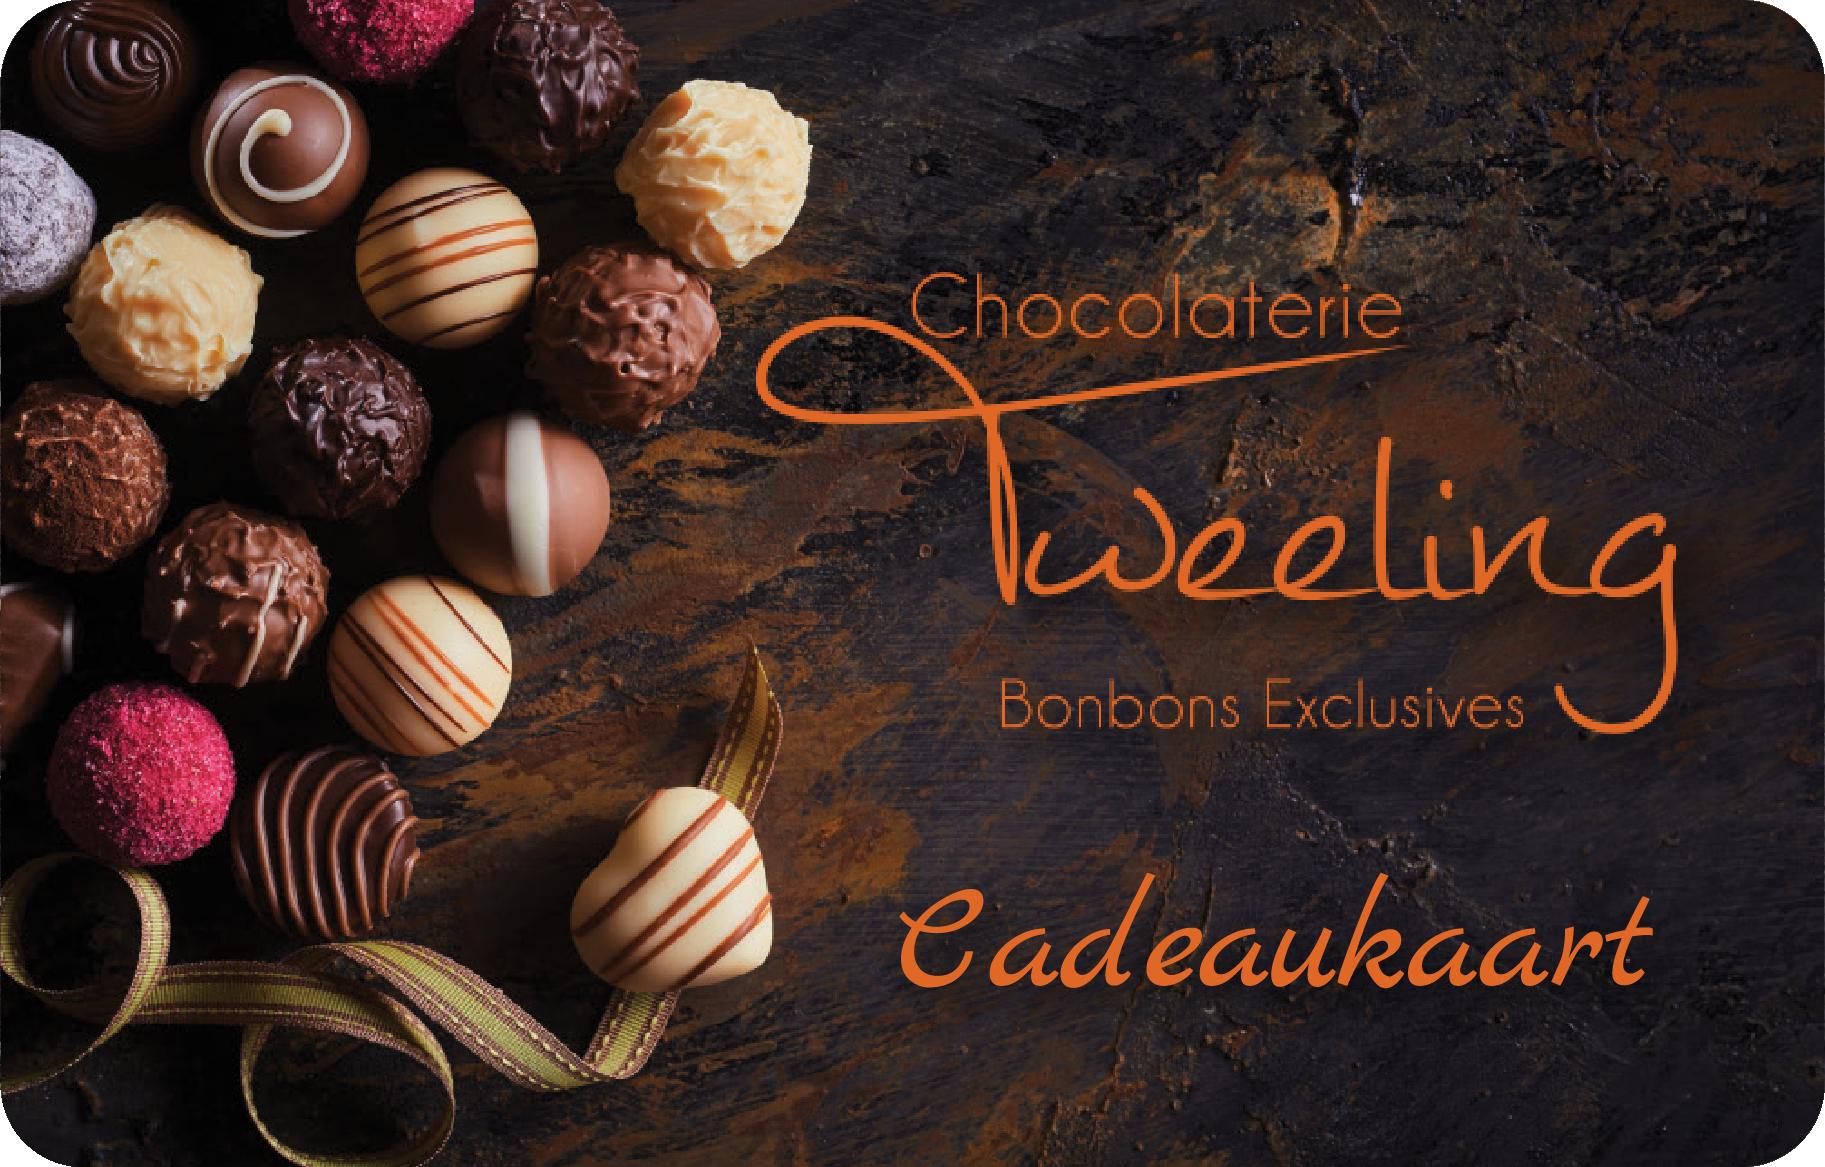 Chocolaterie Tweeling-1